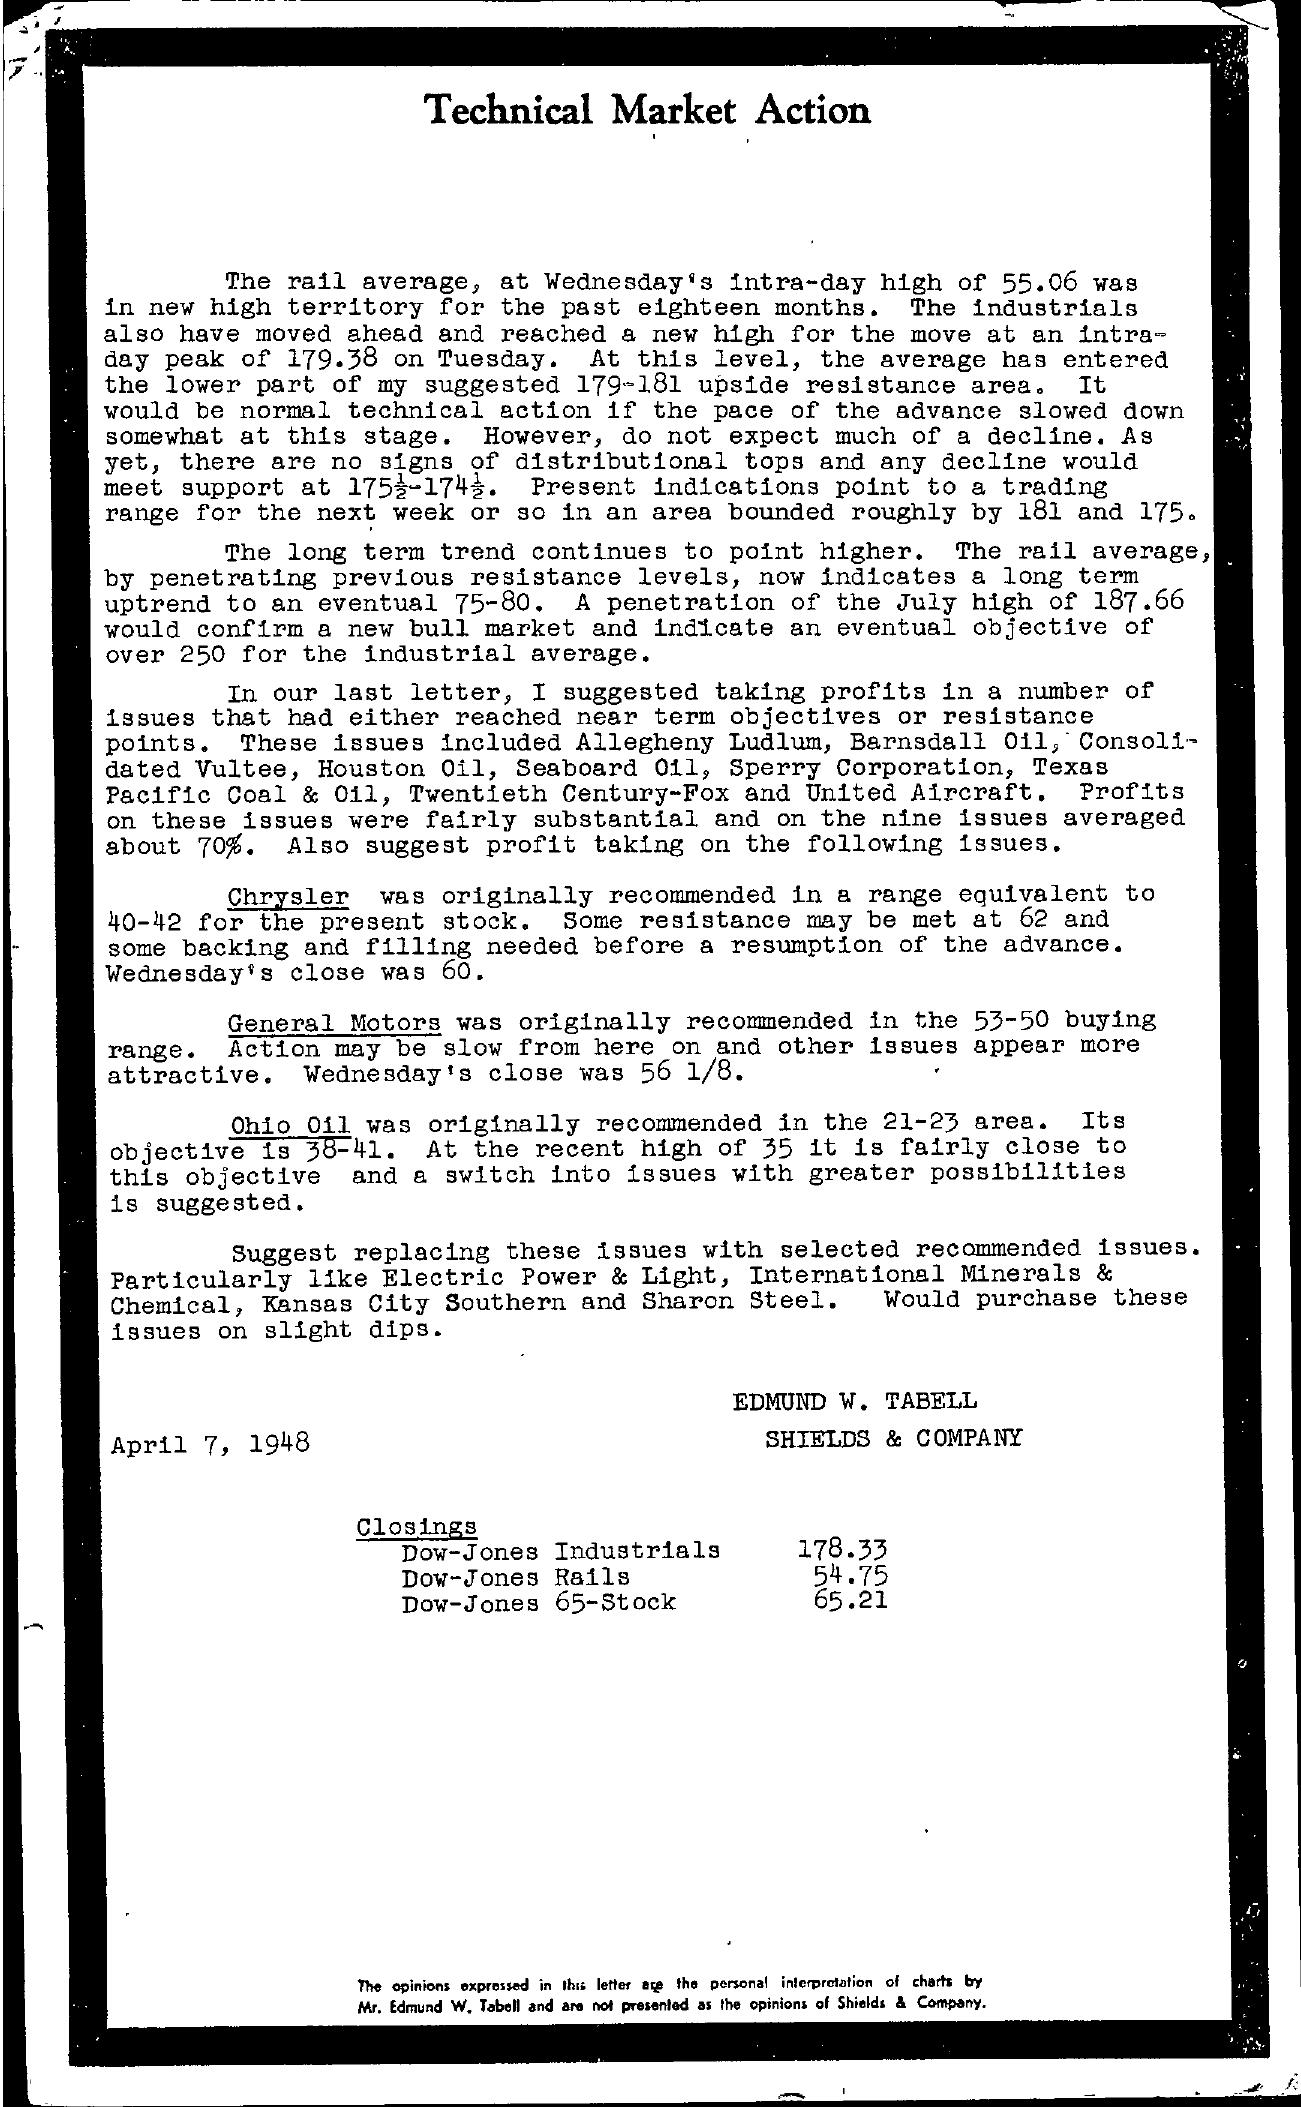 Tabell's Market Letter - April 07, 1948